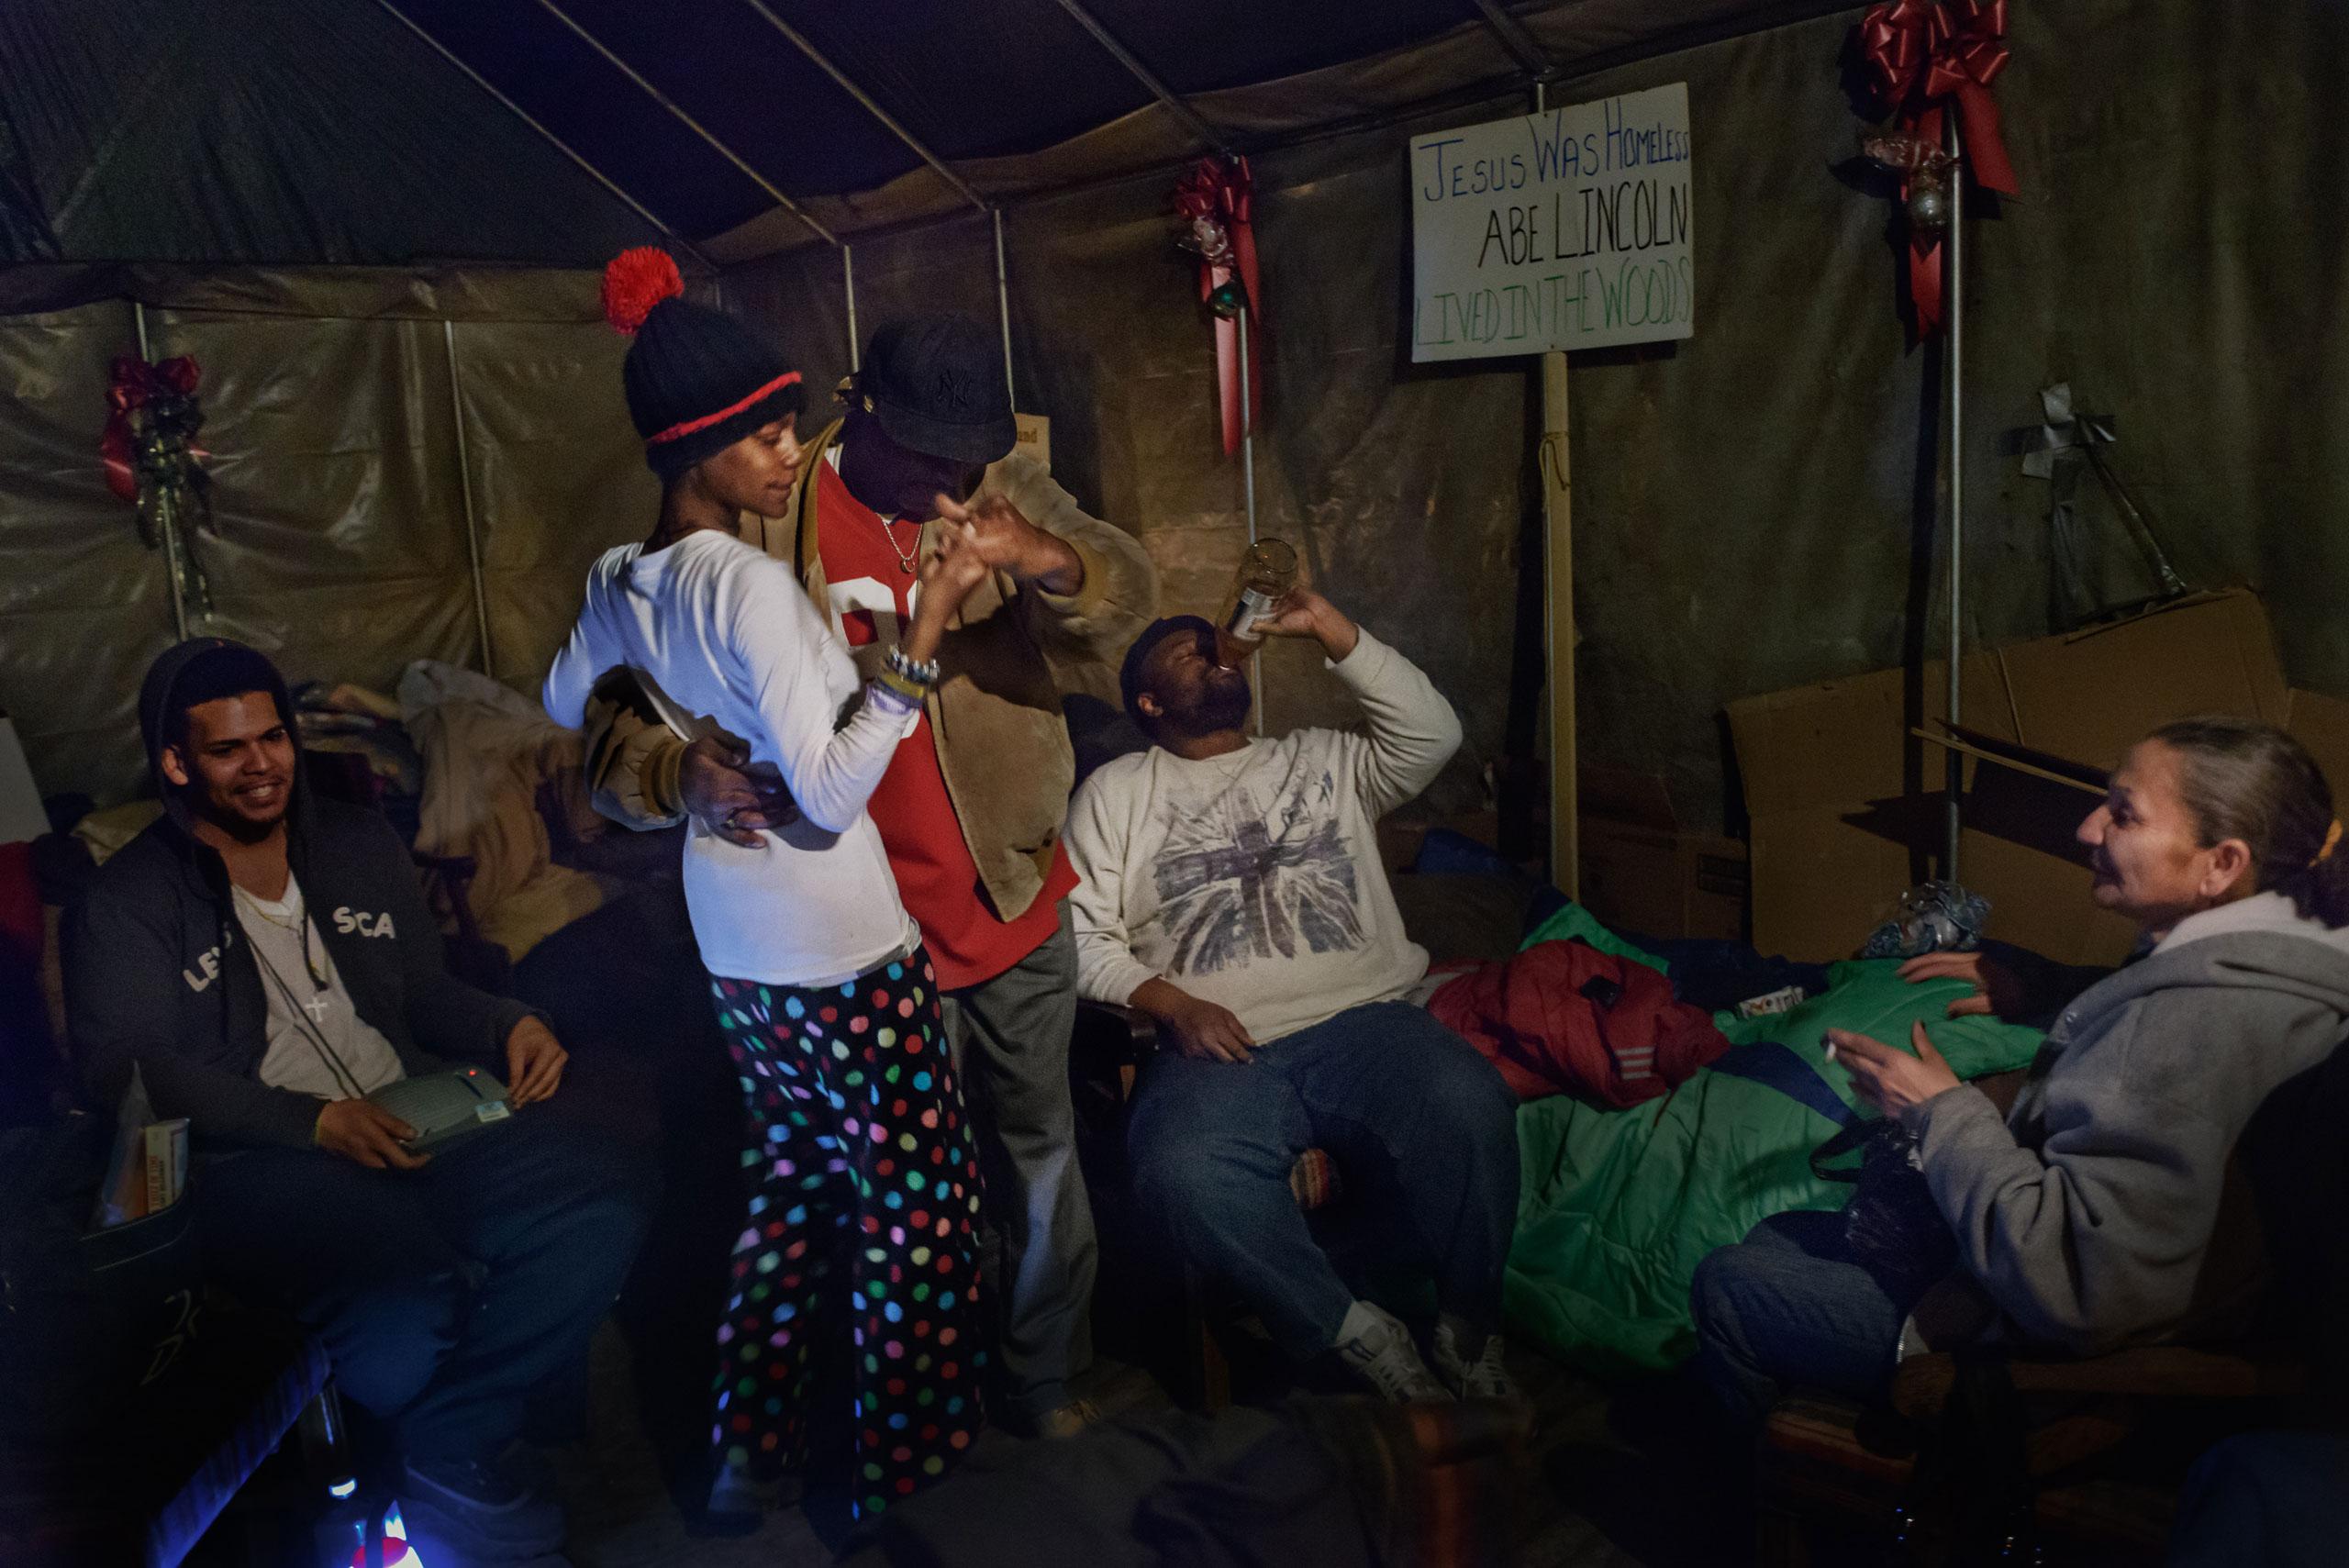 Uncle Mike  dances salsa with Eve inside Tent City's chapel, March 8, 2014.